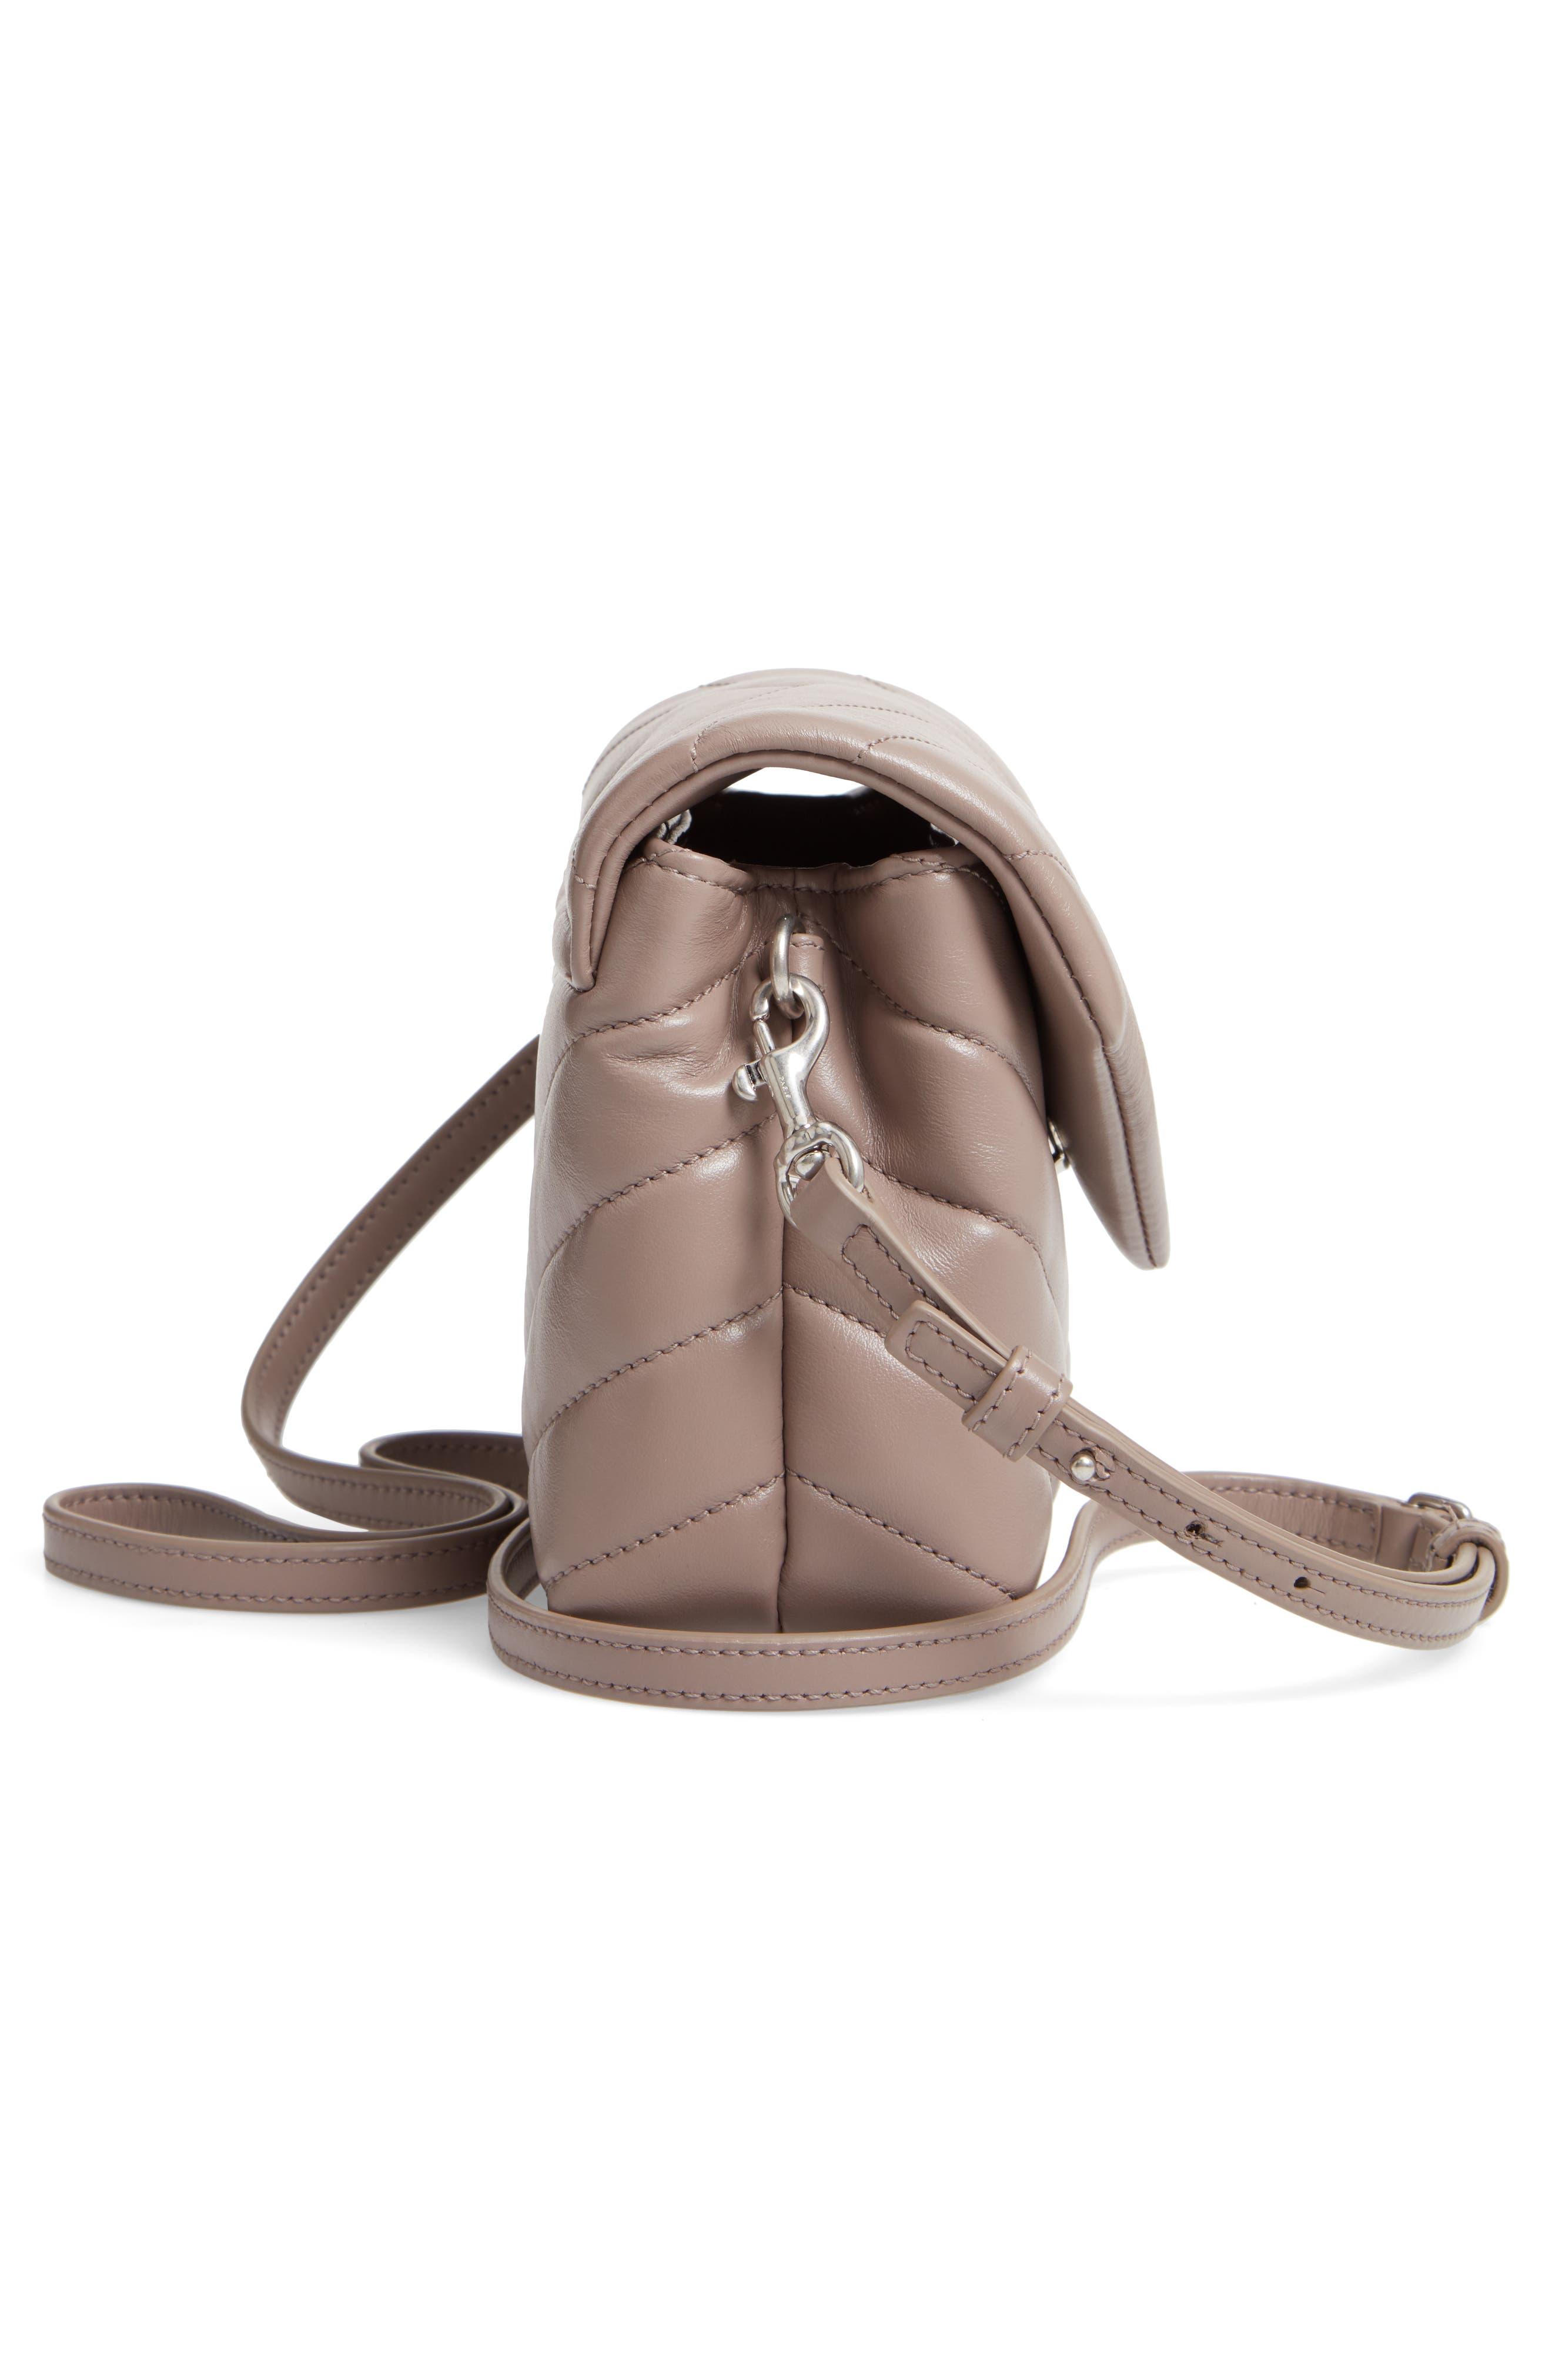 SAINT LAURENT, Toy Loulou Calfskin Leather Crossbody Bag, Alternate thumbnail 5, color, MINK